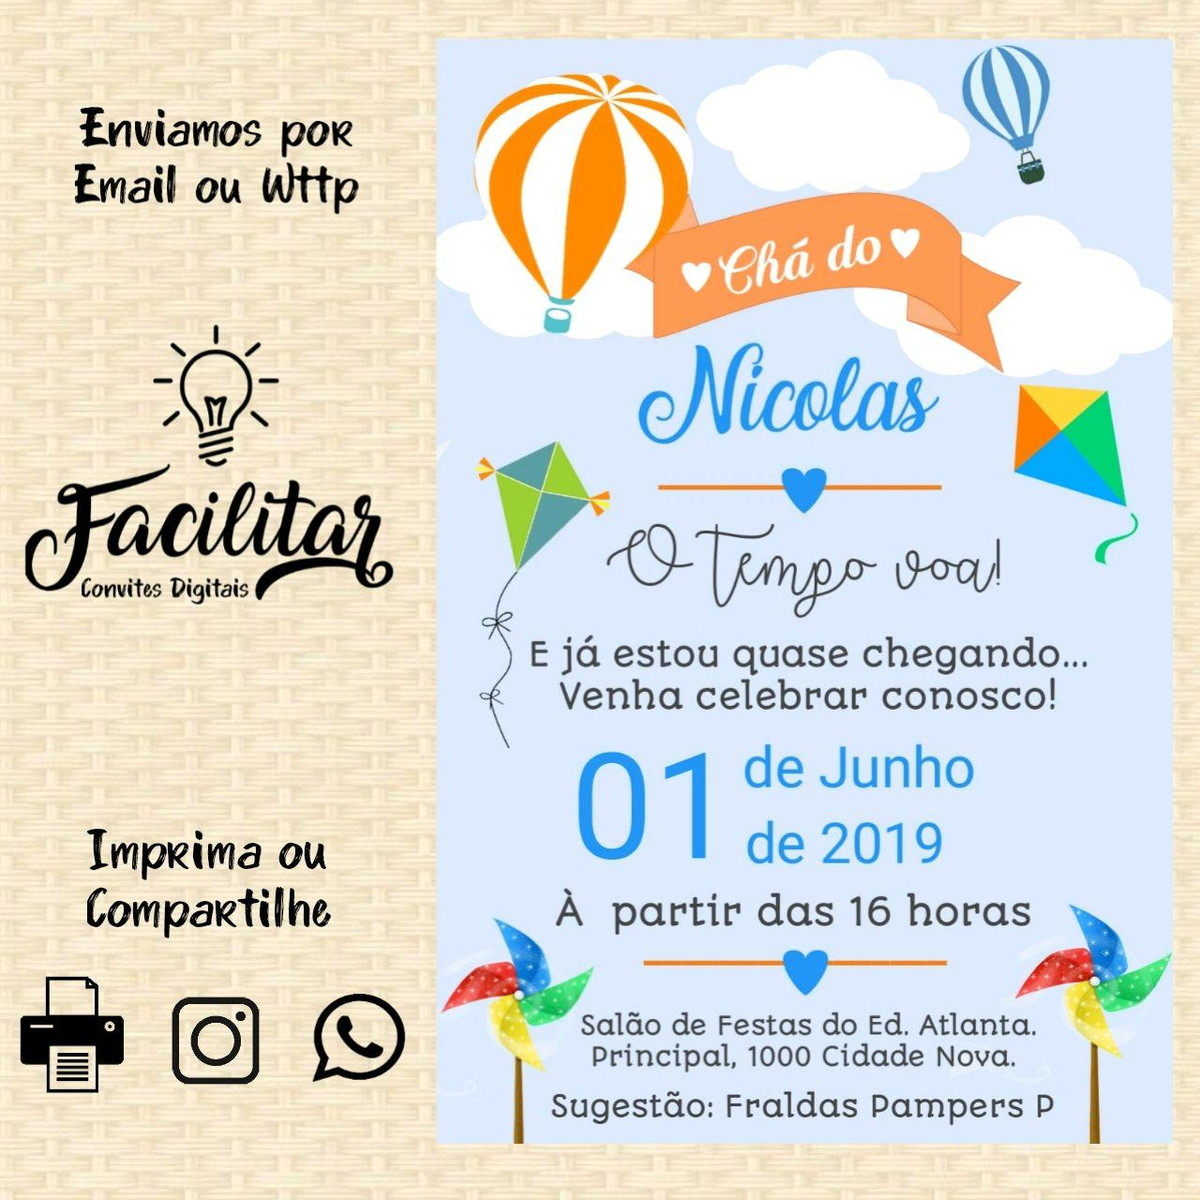 Convite Digital Baloes Pipas E Cataventos Cha De Fraldas No Elo7